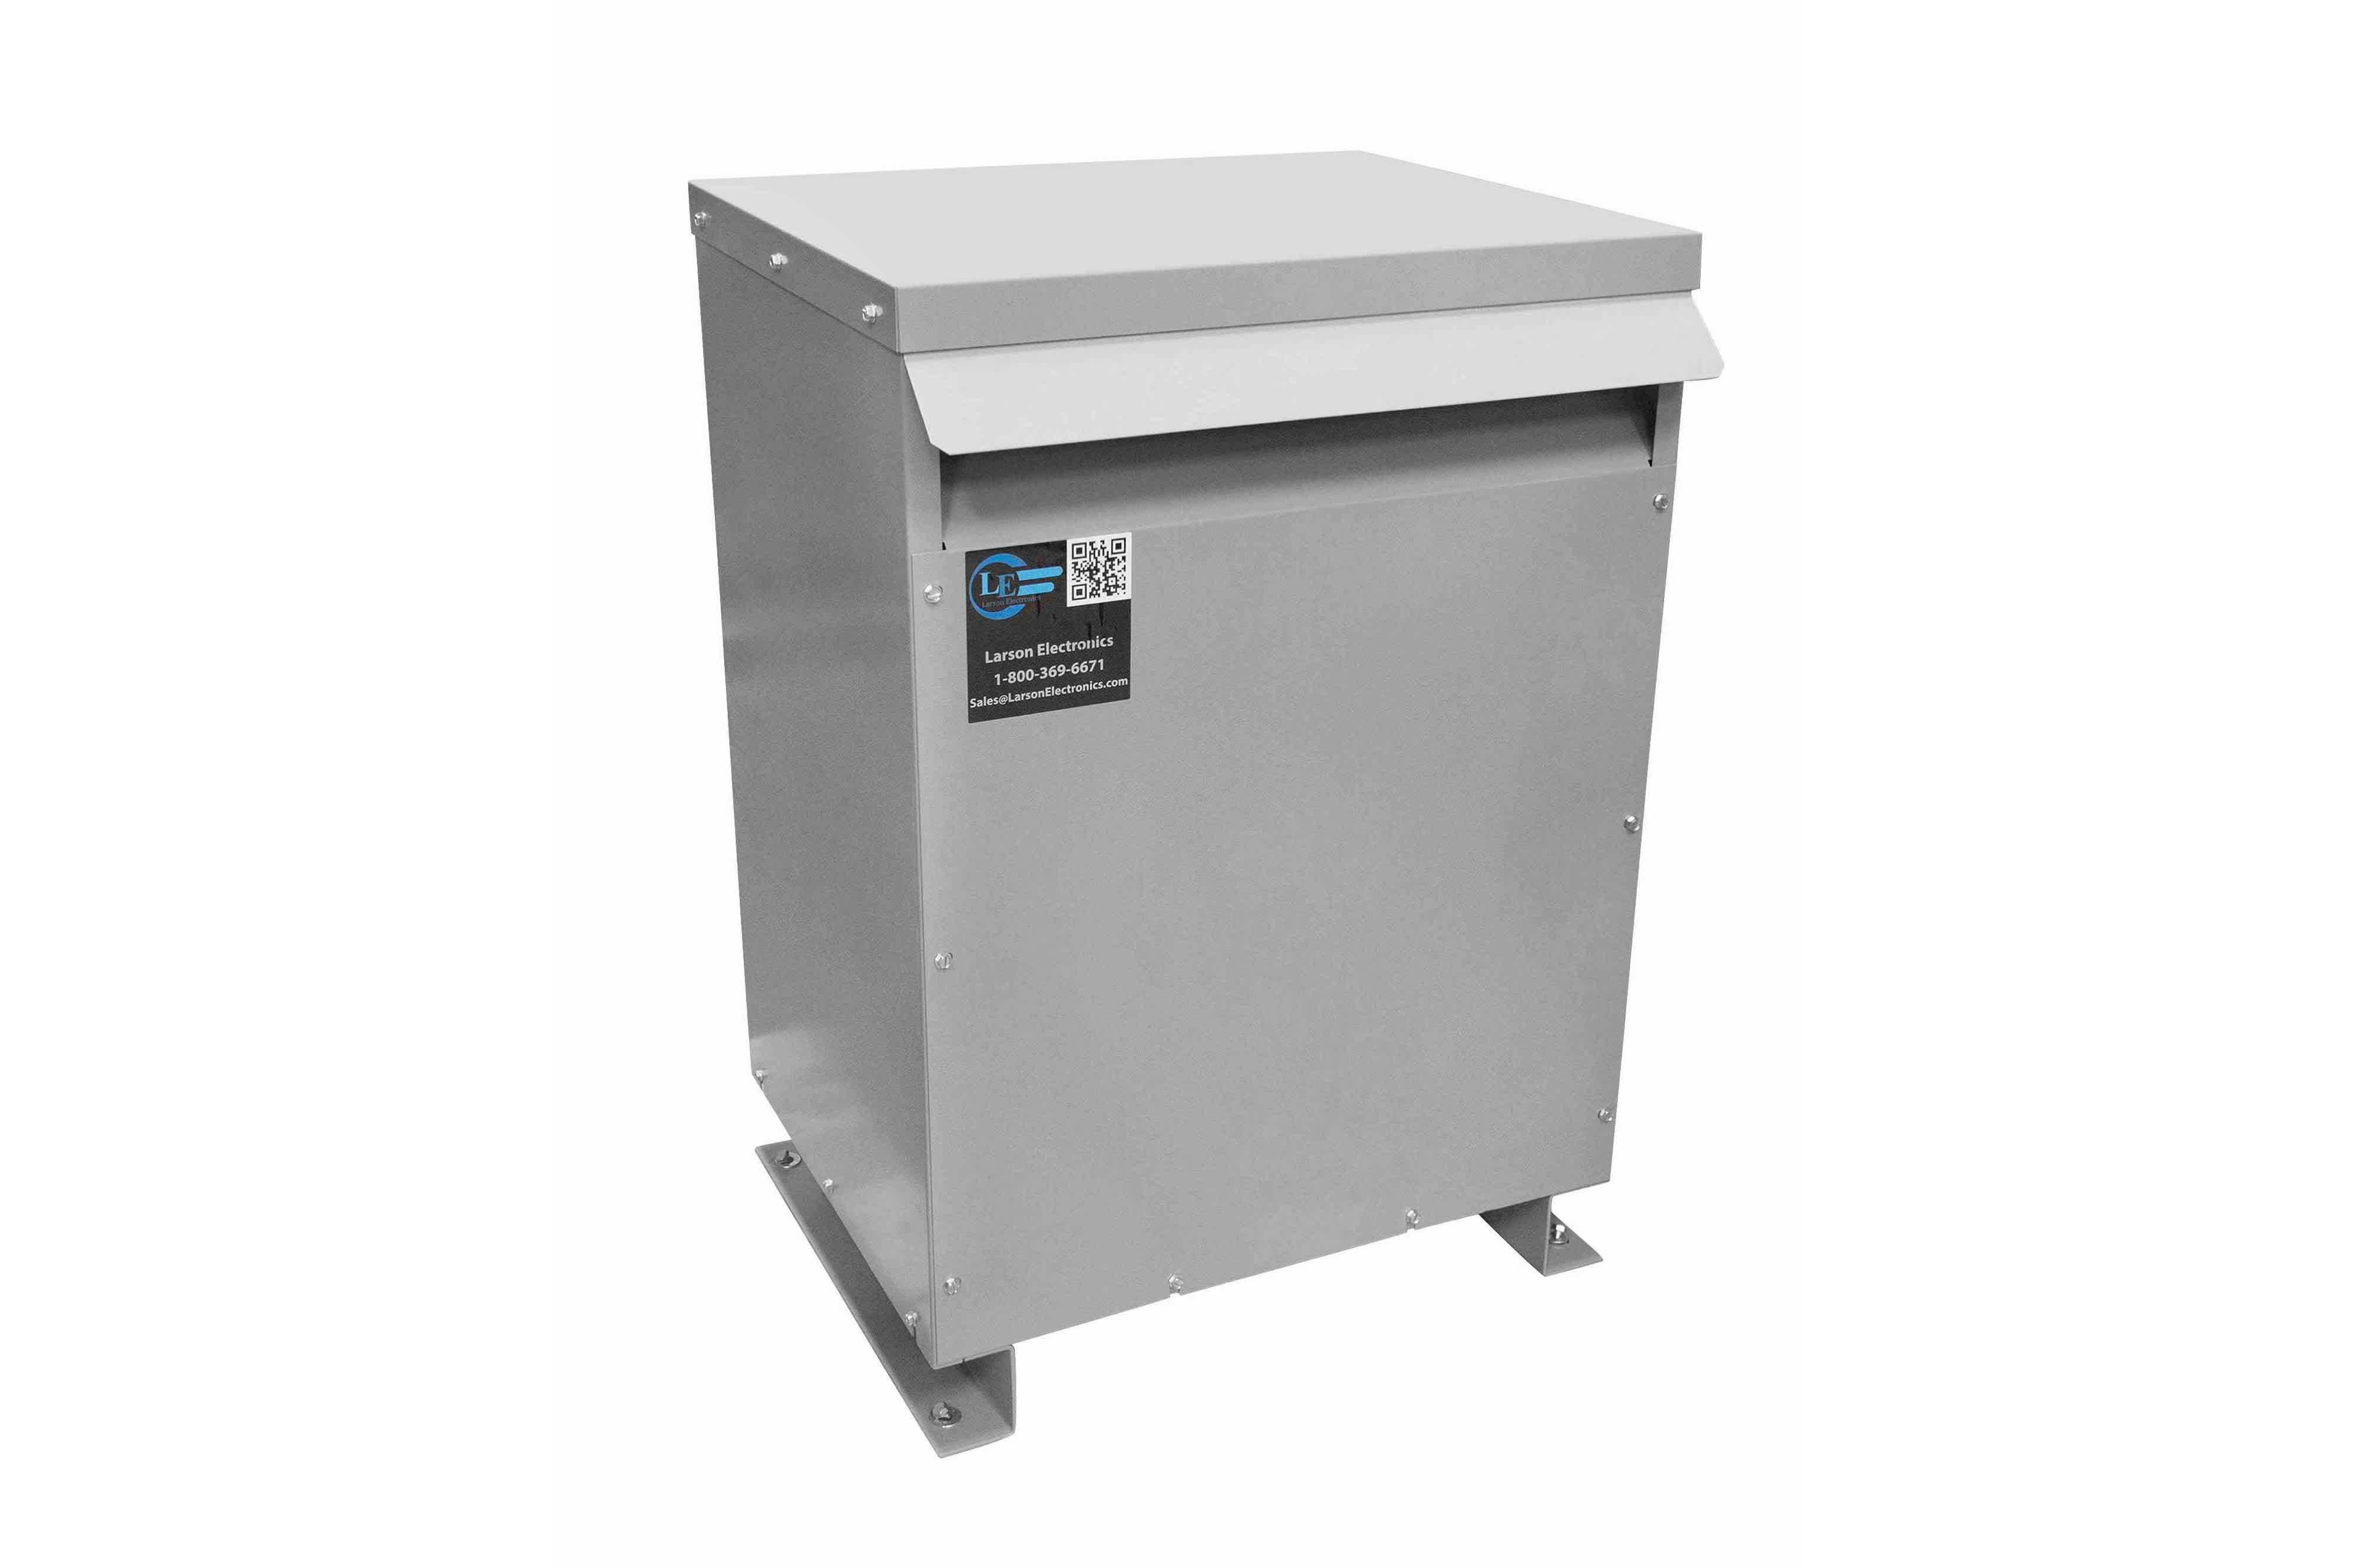 37.5 kVA 3PH Isolation Transformer, 240V Wye Primary, 380V Delta Secondary, N3R, Ventilated, 60 Hz